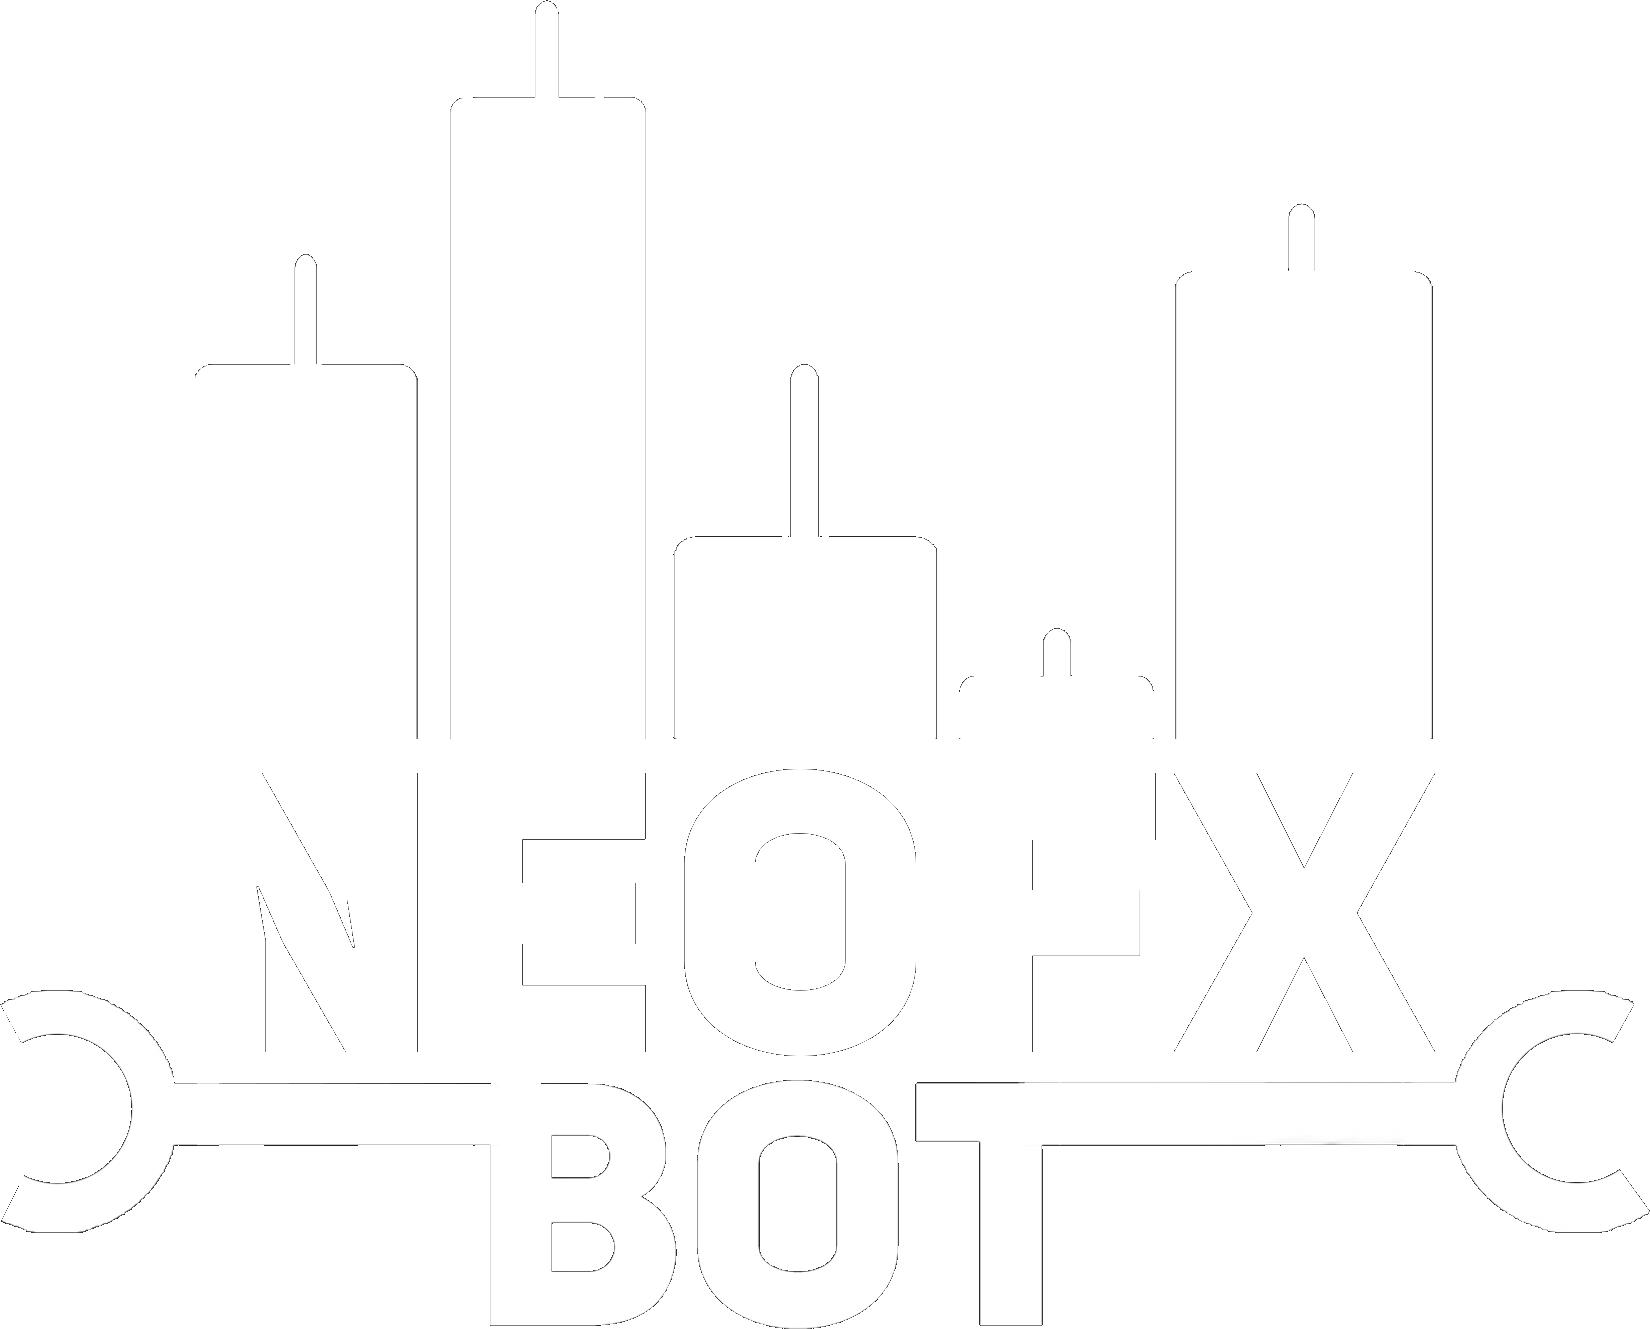 Neofxbot